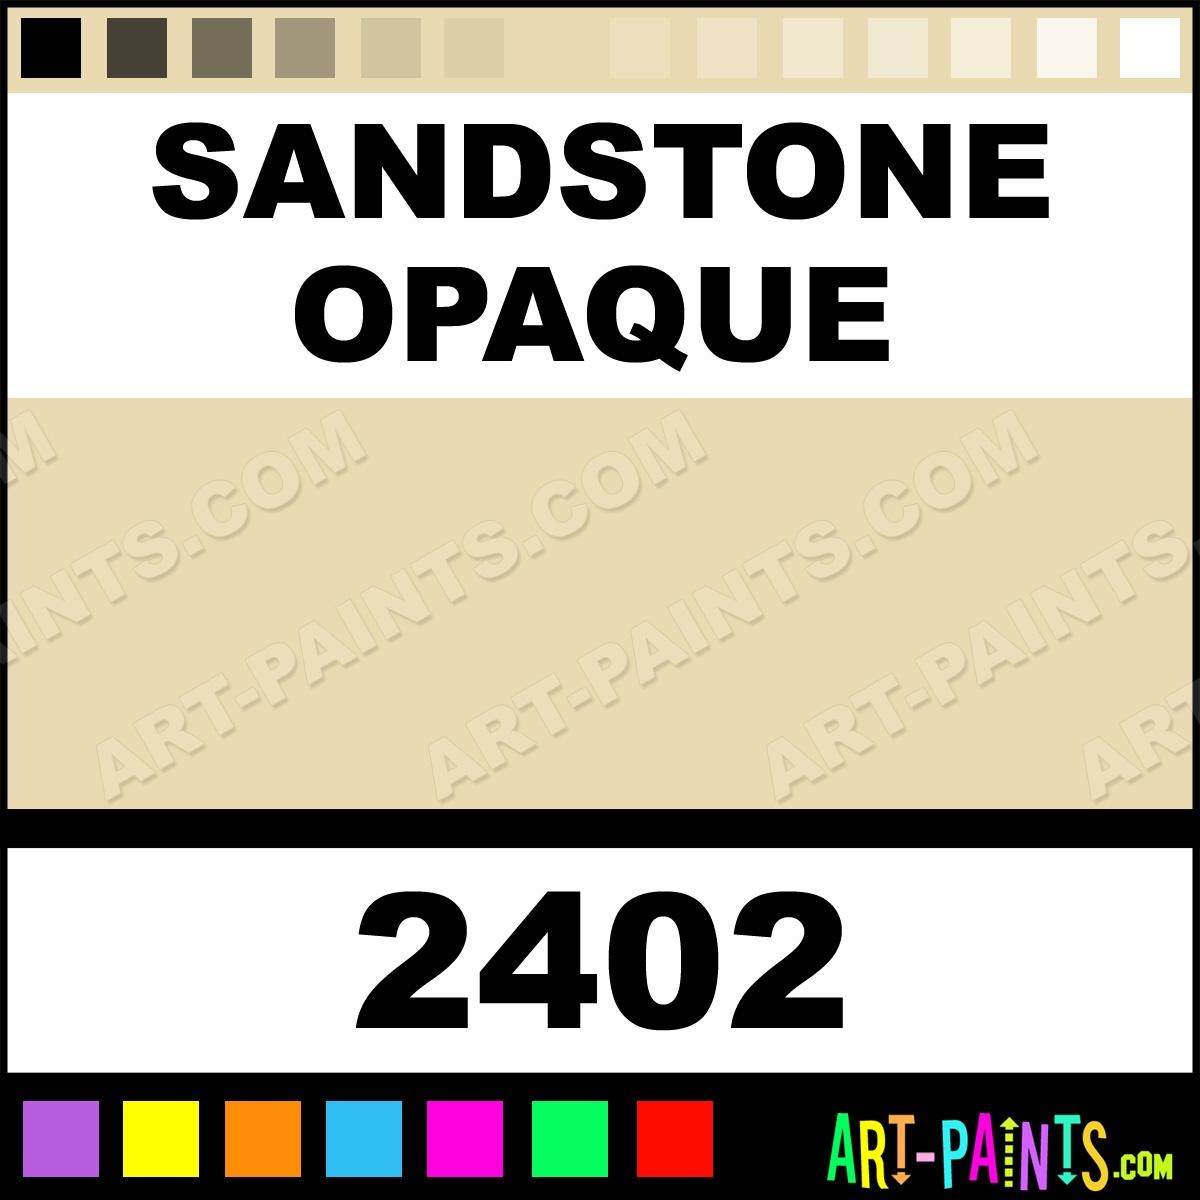 Sandstone opaque delta acrylic paints 2402 sandstone opaque sandstone opaque paint 2402 by ceramcoat nvjuhfo Choice Image